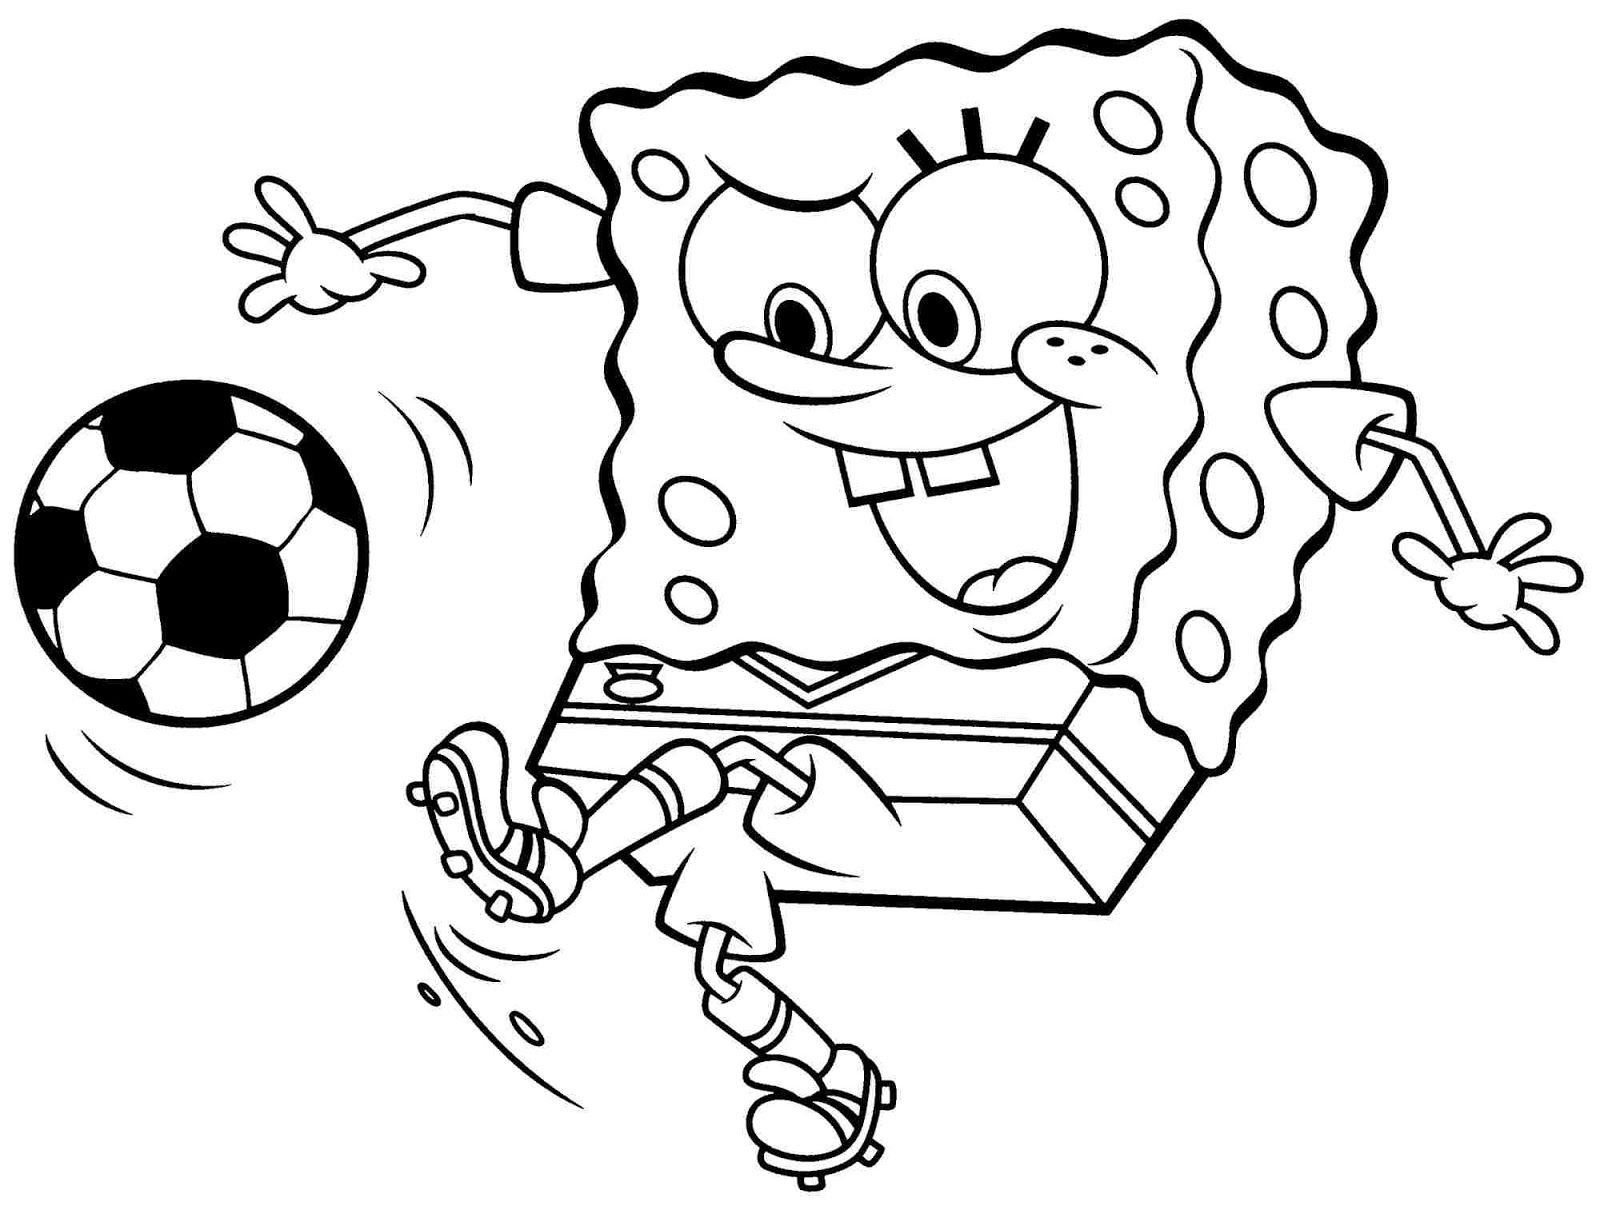 13 Mewarnai Gambar Spongebob